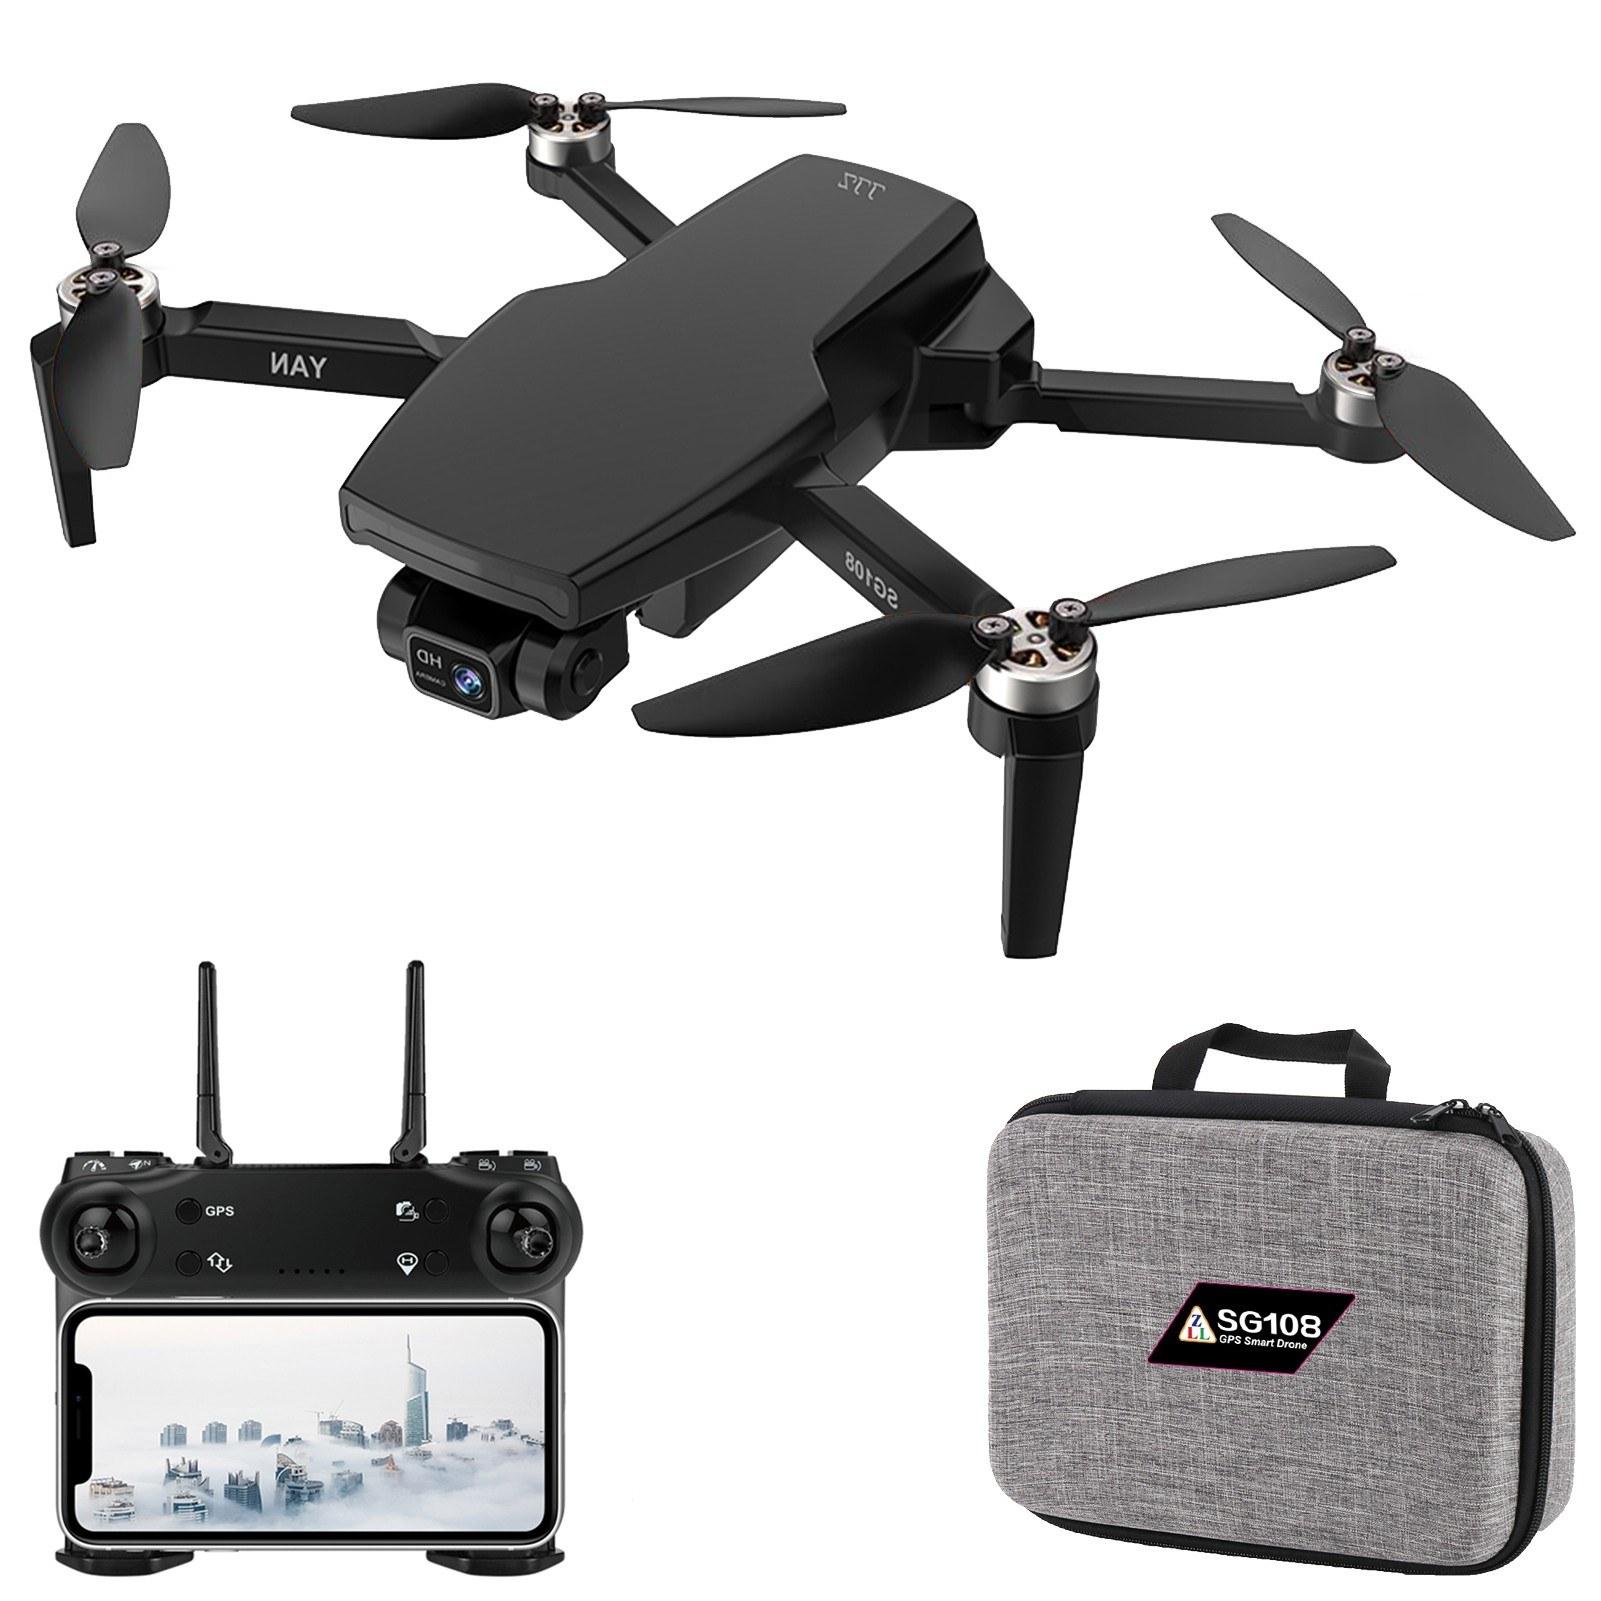 48% OFF ZLRC SG108 PRO 5G Wifi FPV GPS 4K Camera RC Drone, Free Shipping $135.99